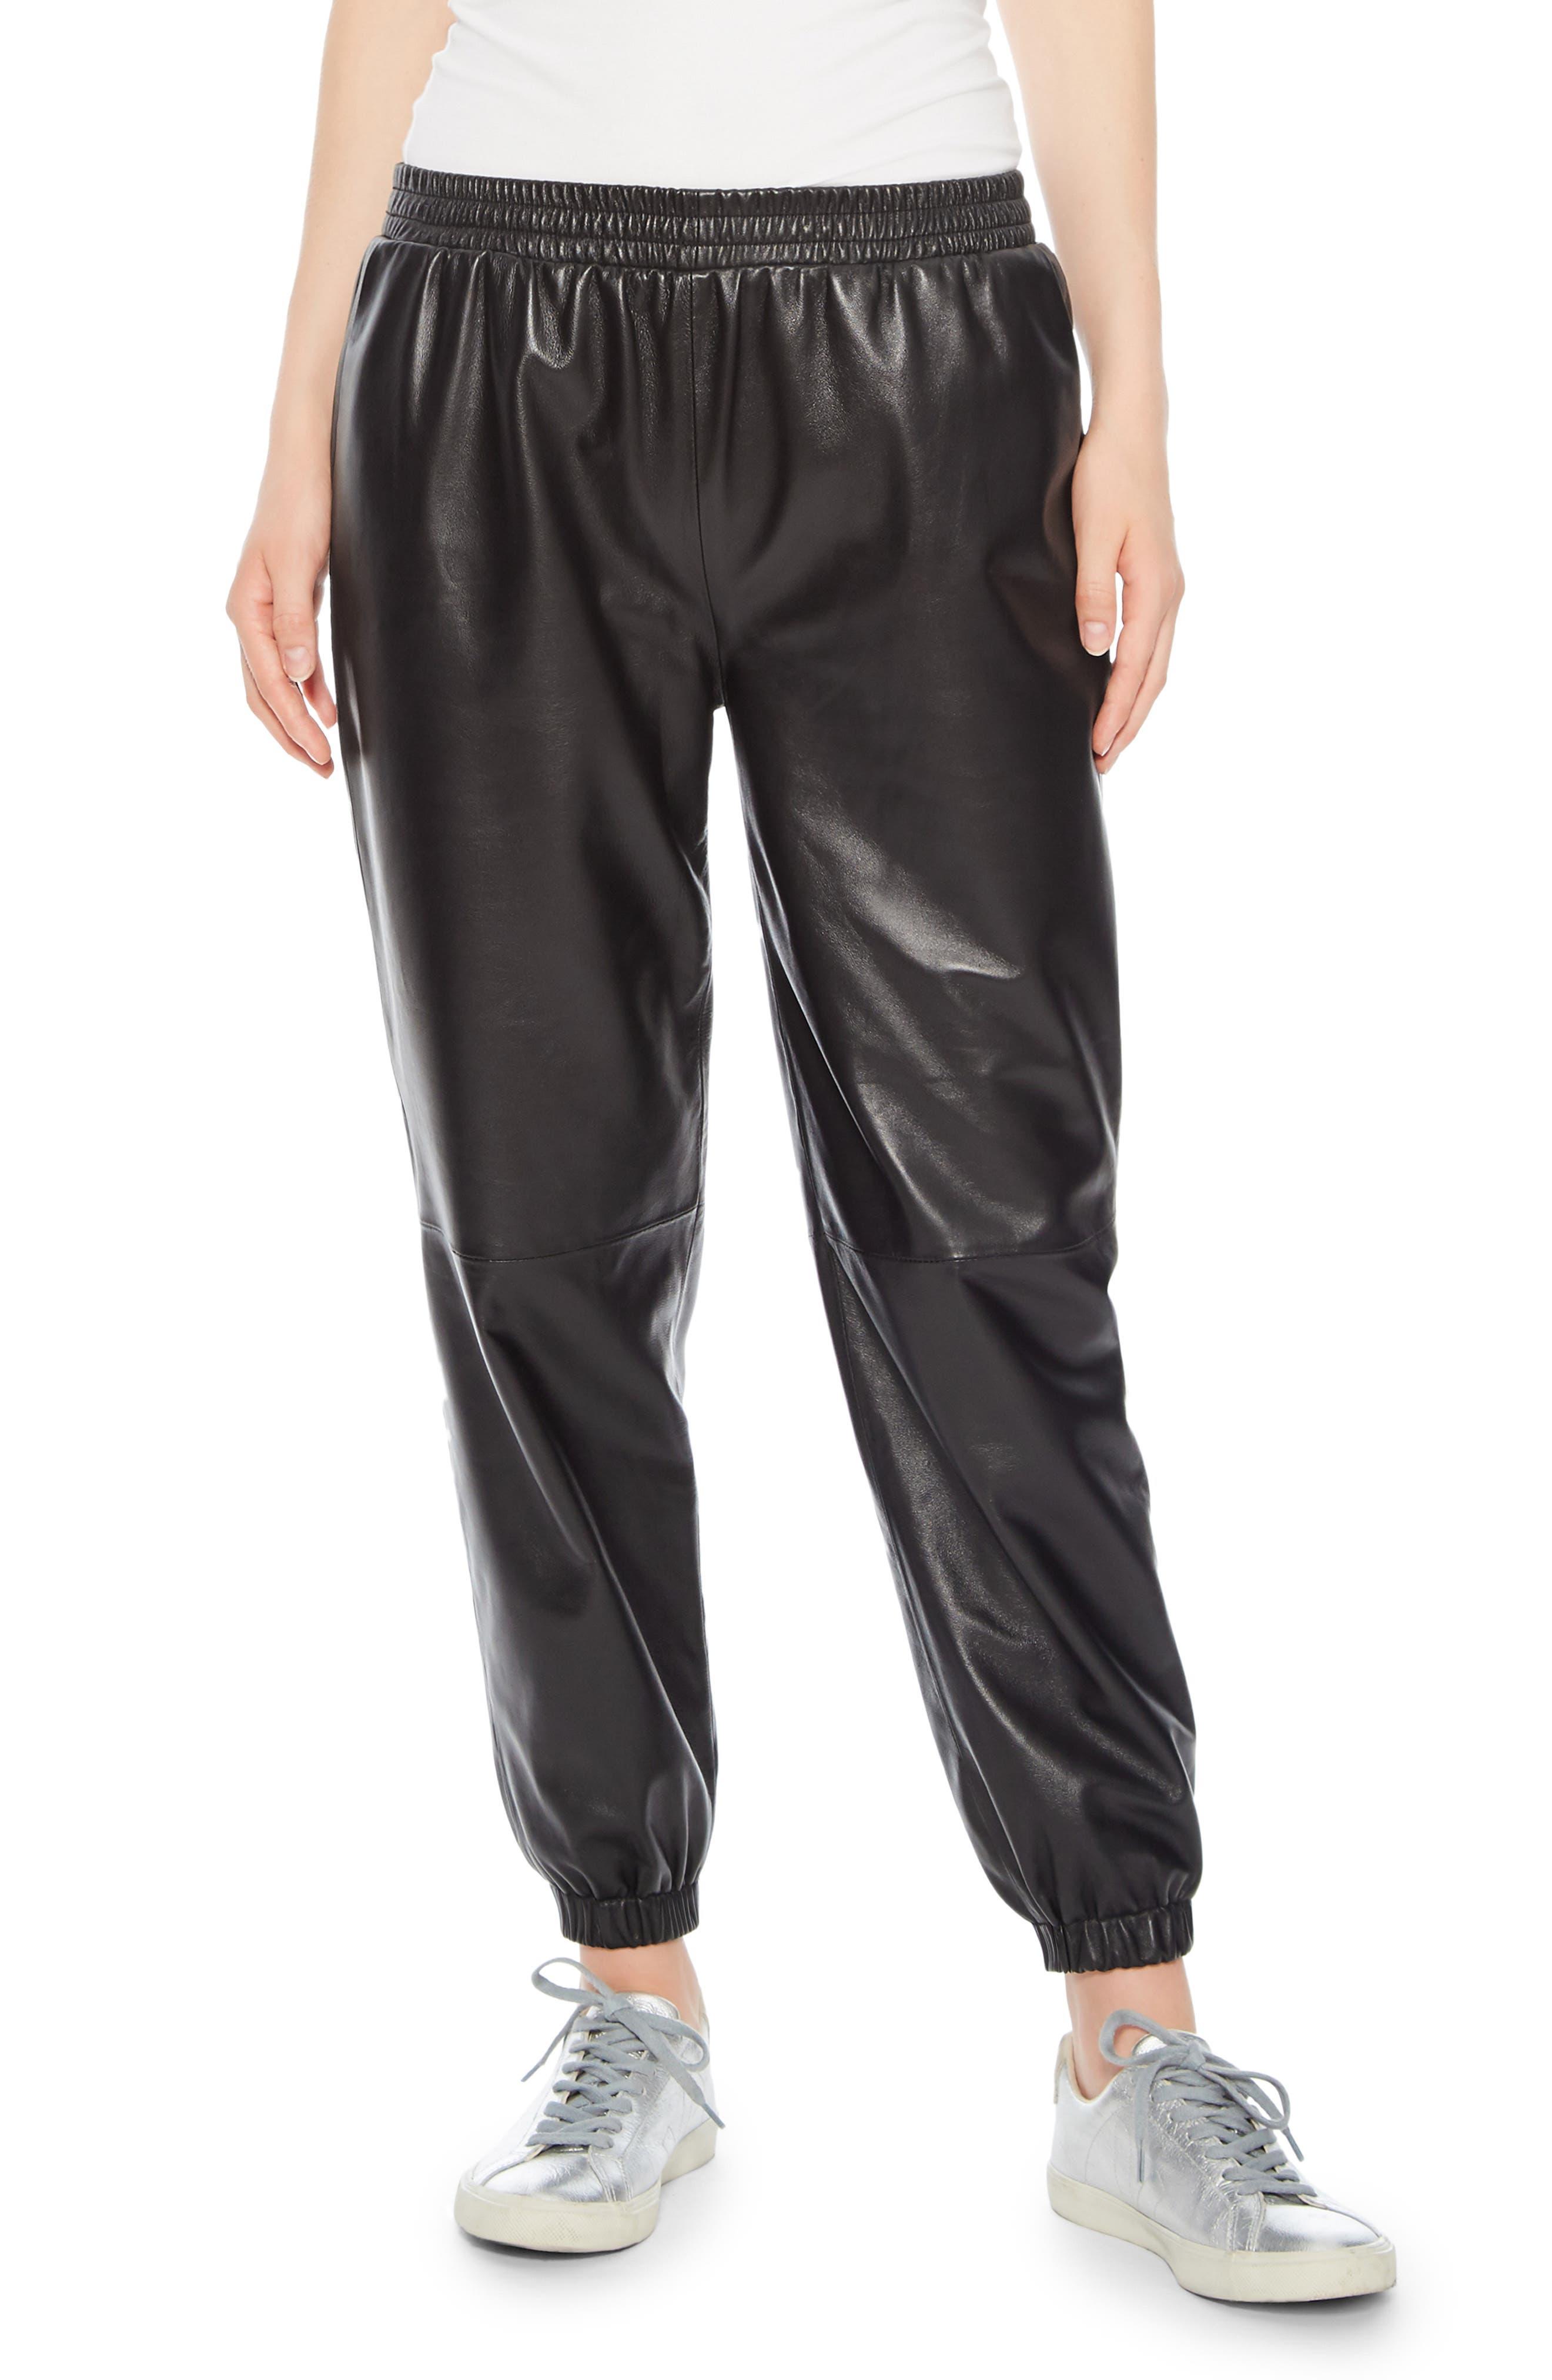 Eavan Leather Jogger Pants,                         Main,                         color, 001